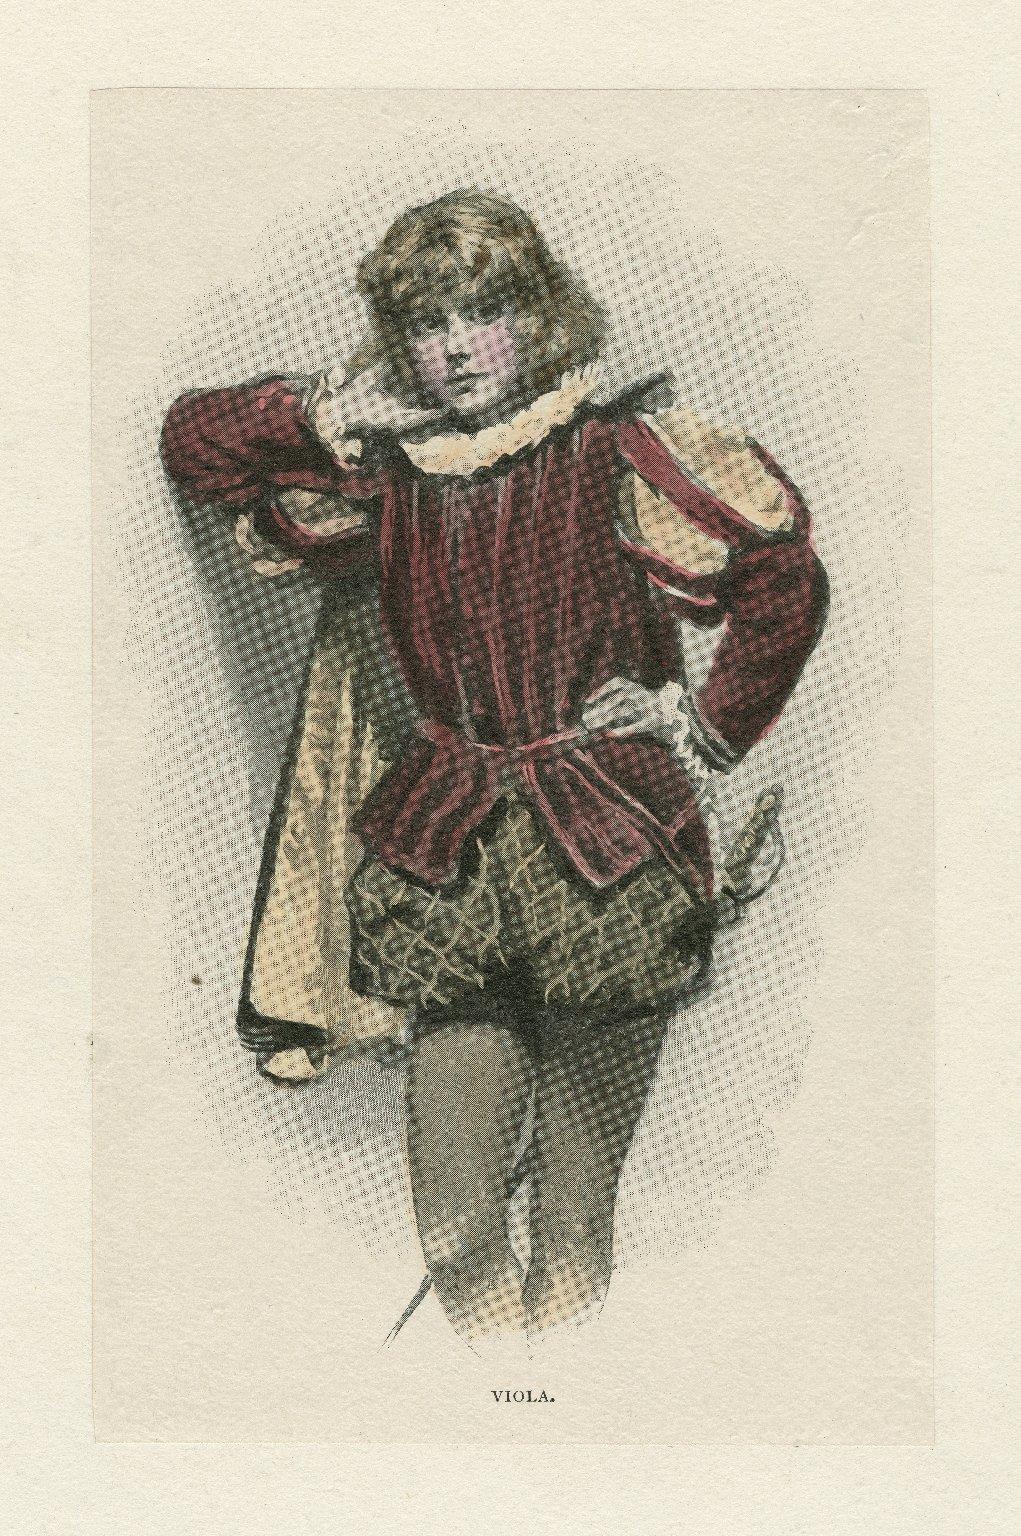 Viola [in Twelfth night] [graphic].